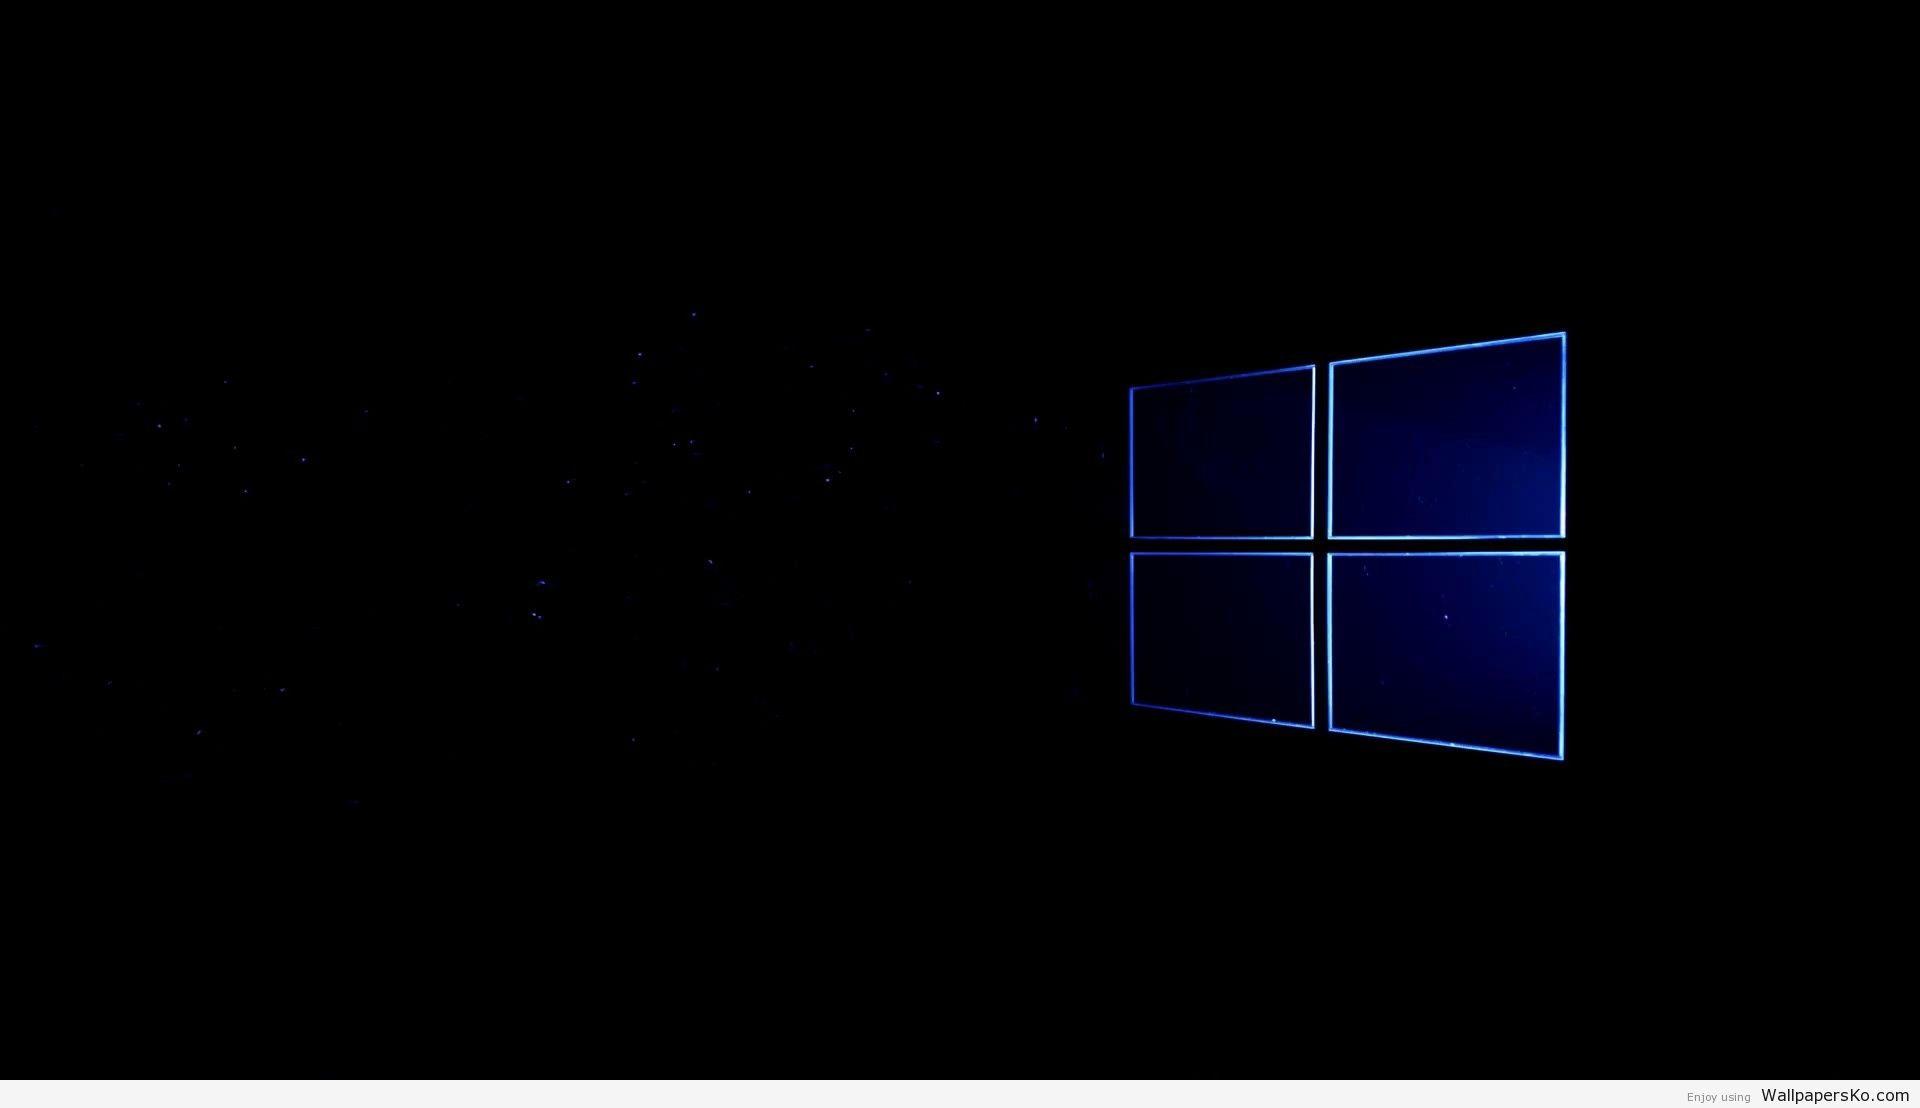 Windows Wallpaper Http Wallpapersko Com Windows Wallpaper Html Hd Wallpapers Download Windows Wallpaper Wallpaper Windows 10 Screen Savers Wallpapers